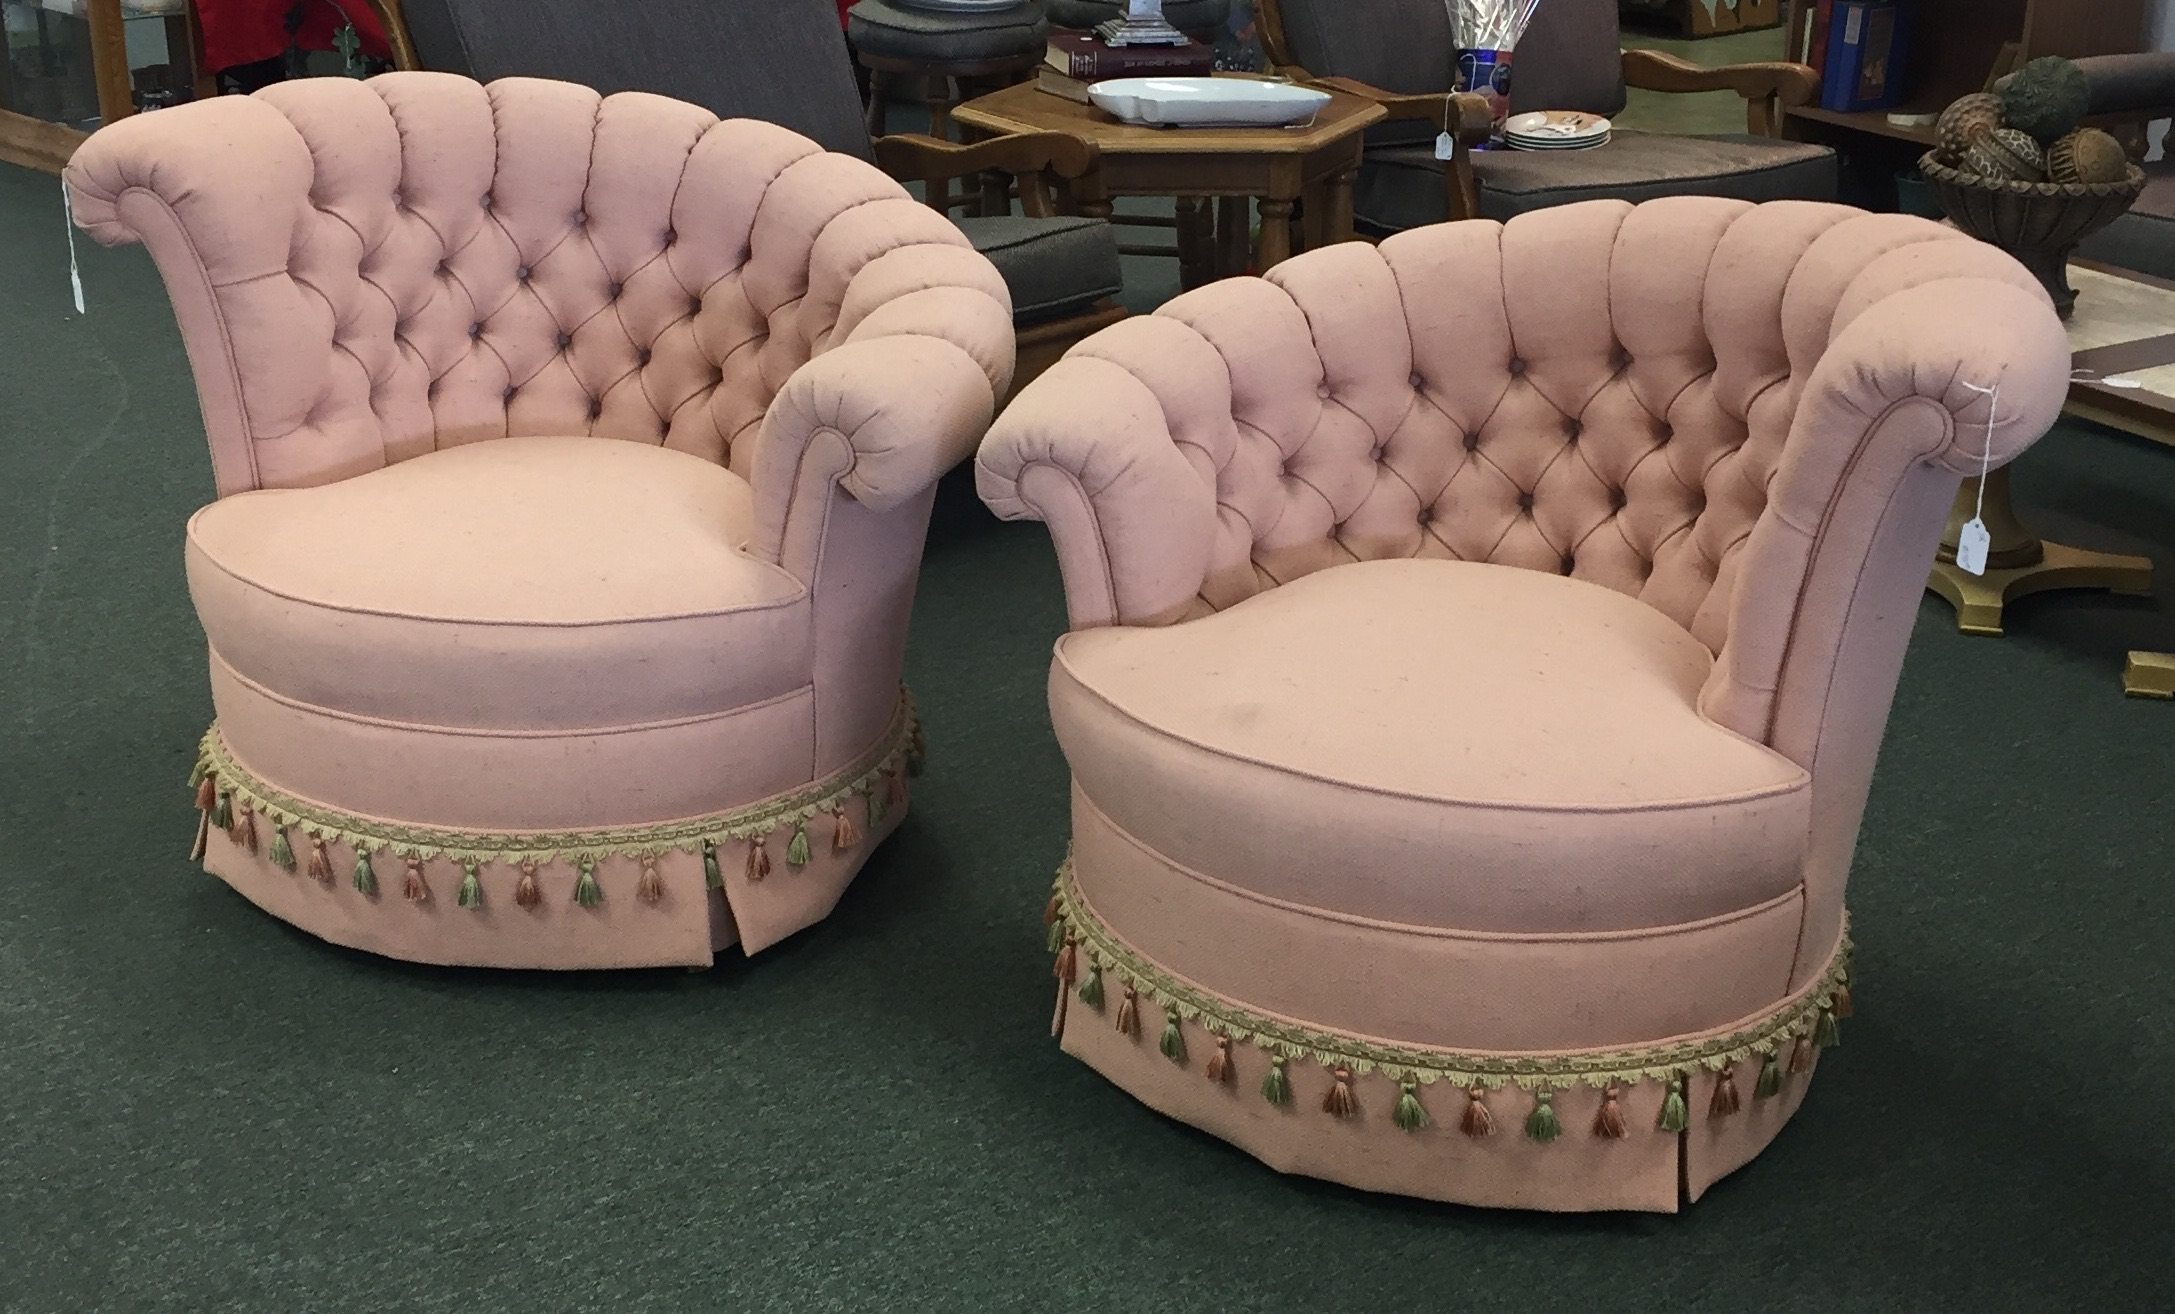 Pleasing Vintage Chair Rentals Runaway Belle Oklahoma City Forskolin Free Trial Chair Design Images Forskolin Free Trialorg